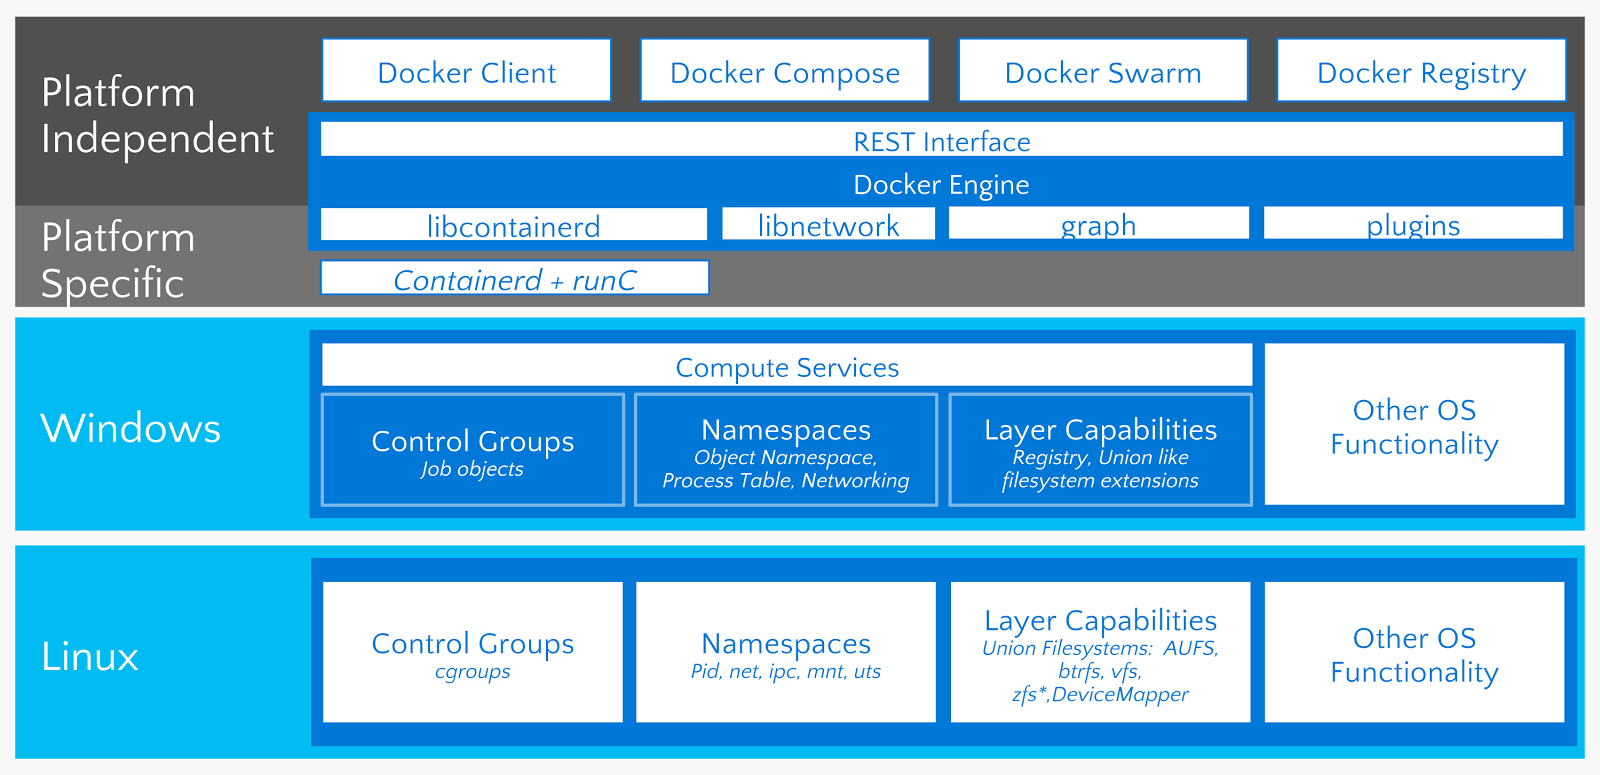 Introducing Docker for Windows Server 2016 - Docker Blog